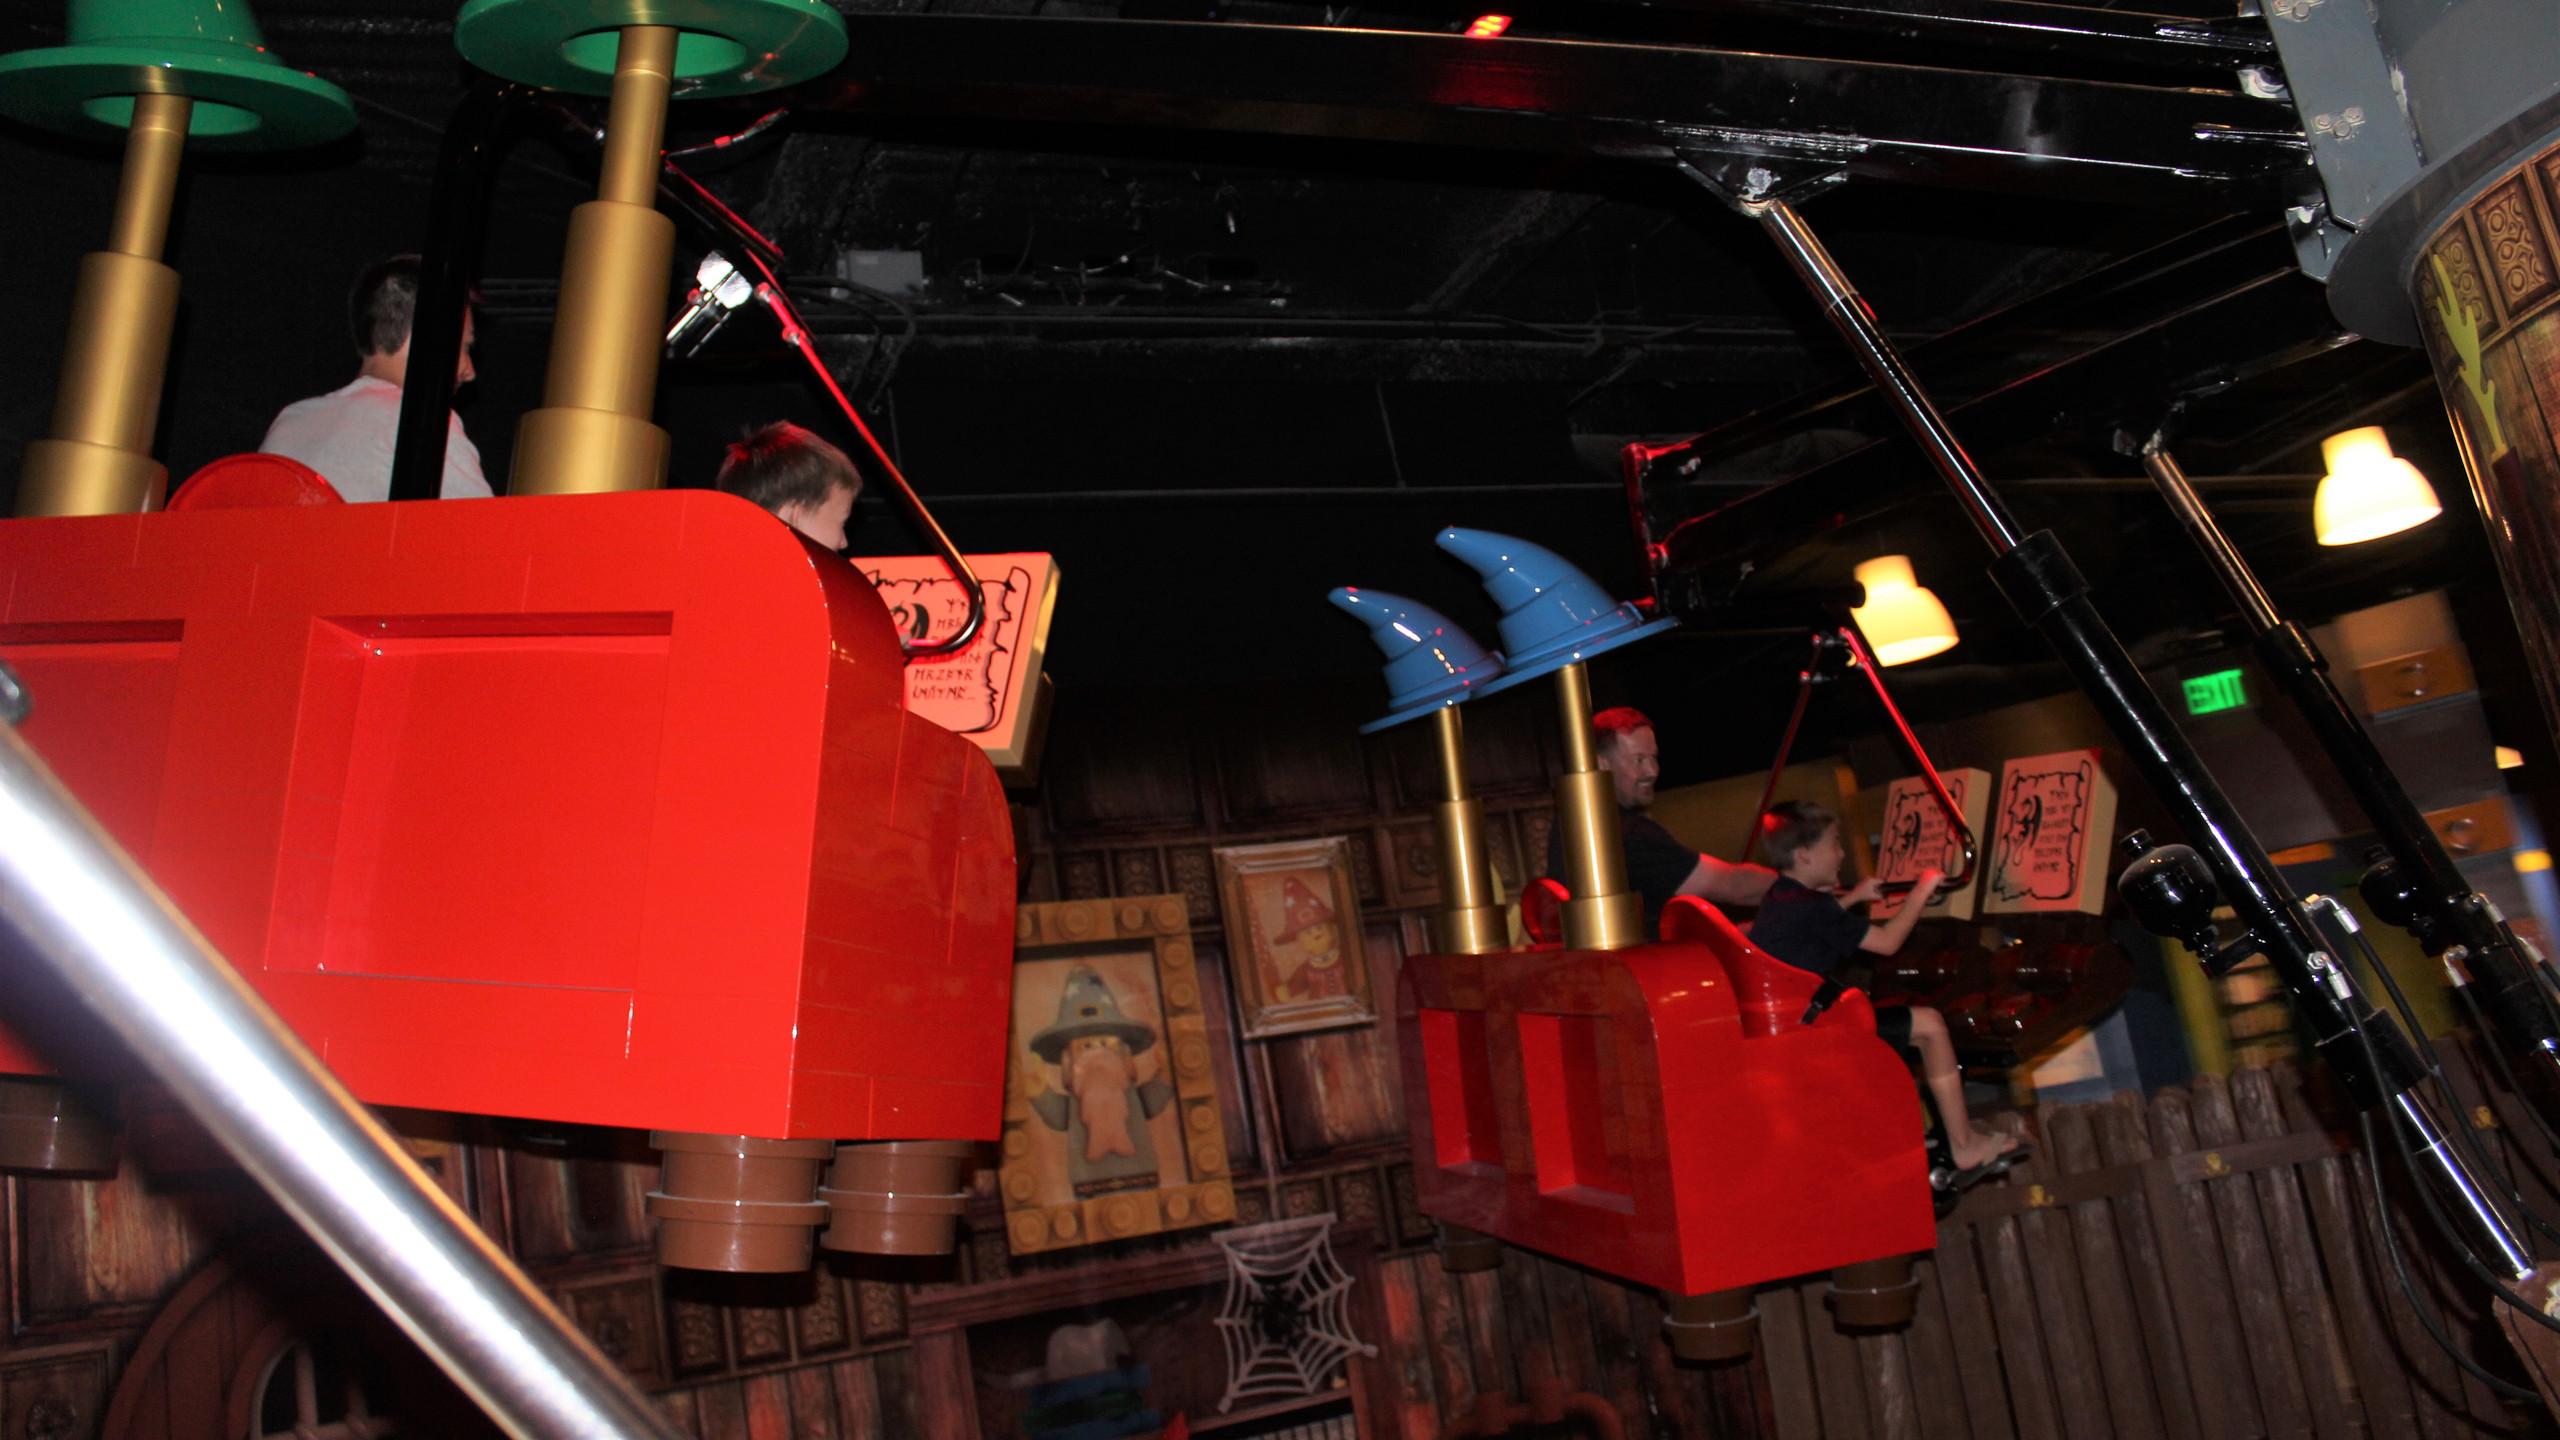 Merlin's Apprentice Flying Ride at LEGOLAND Discovery Center in Kansas City